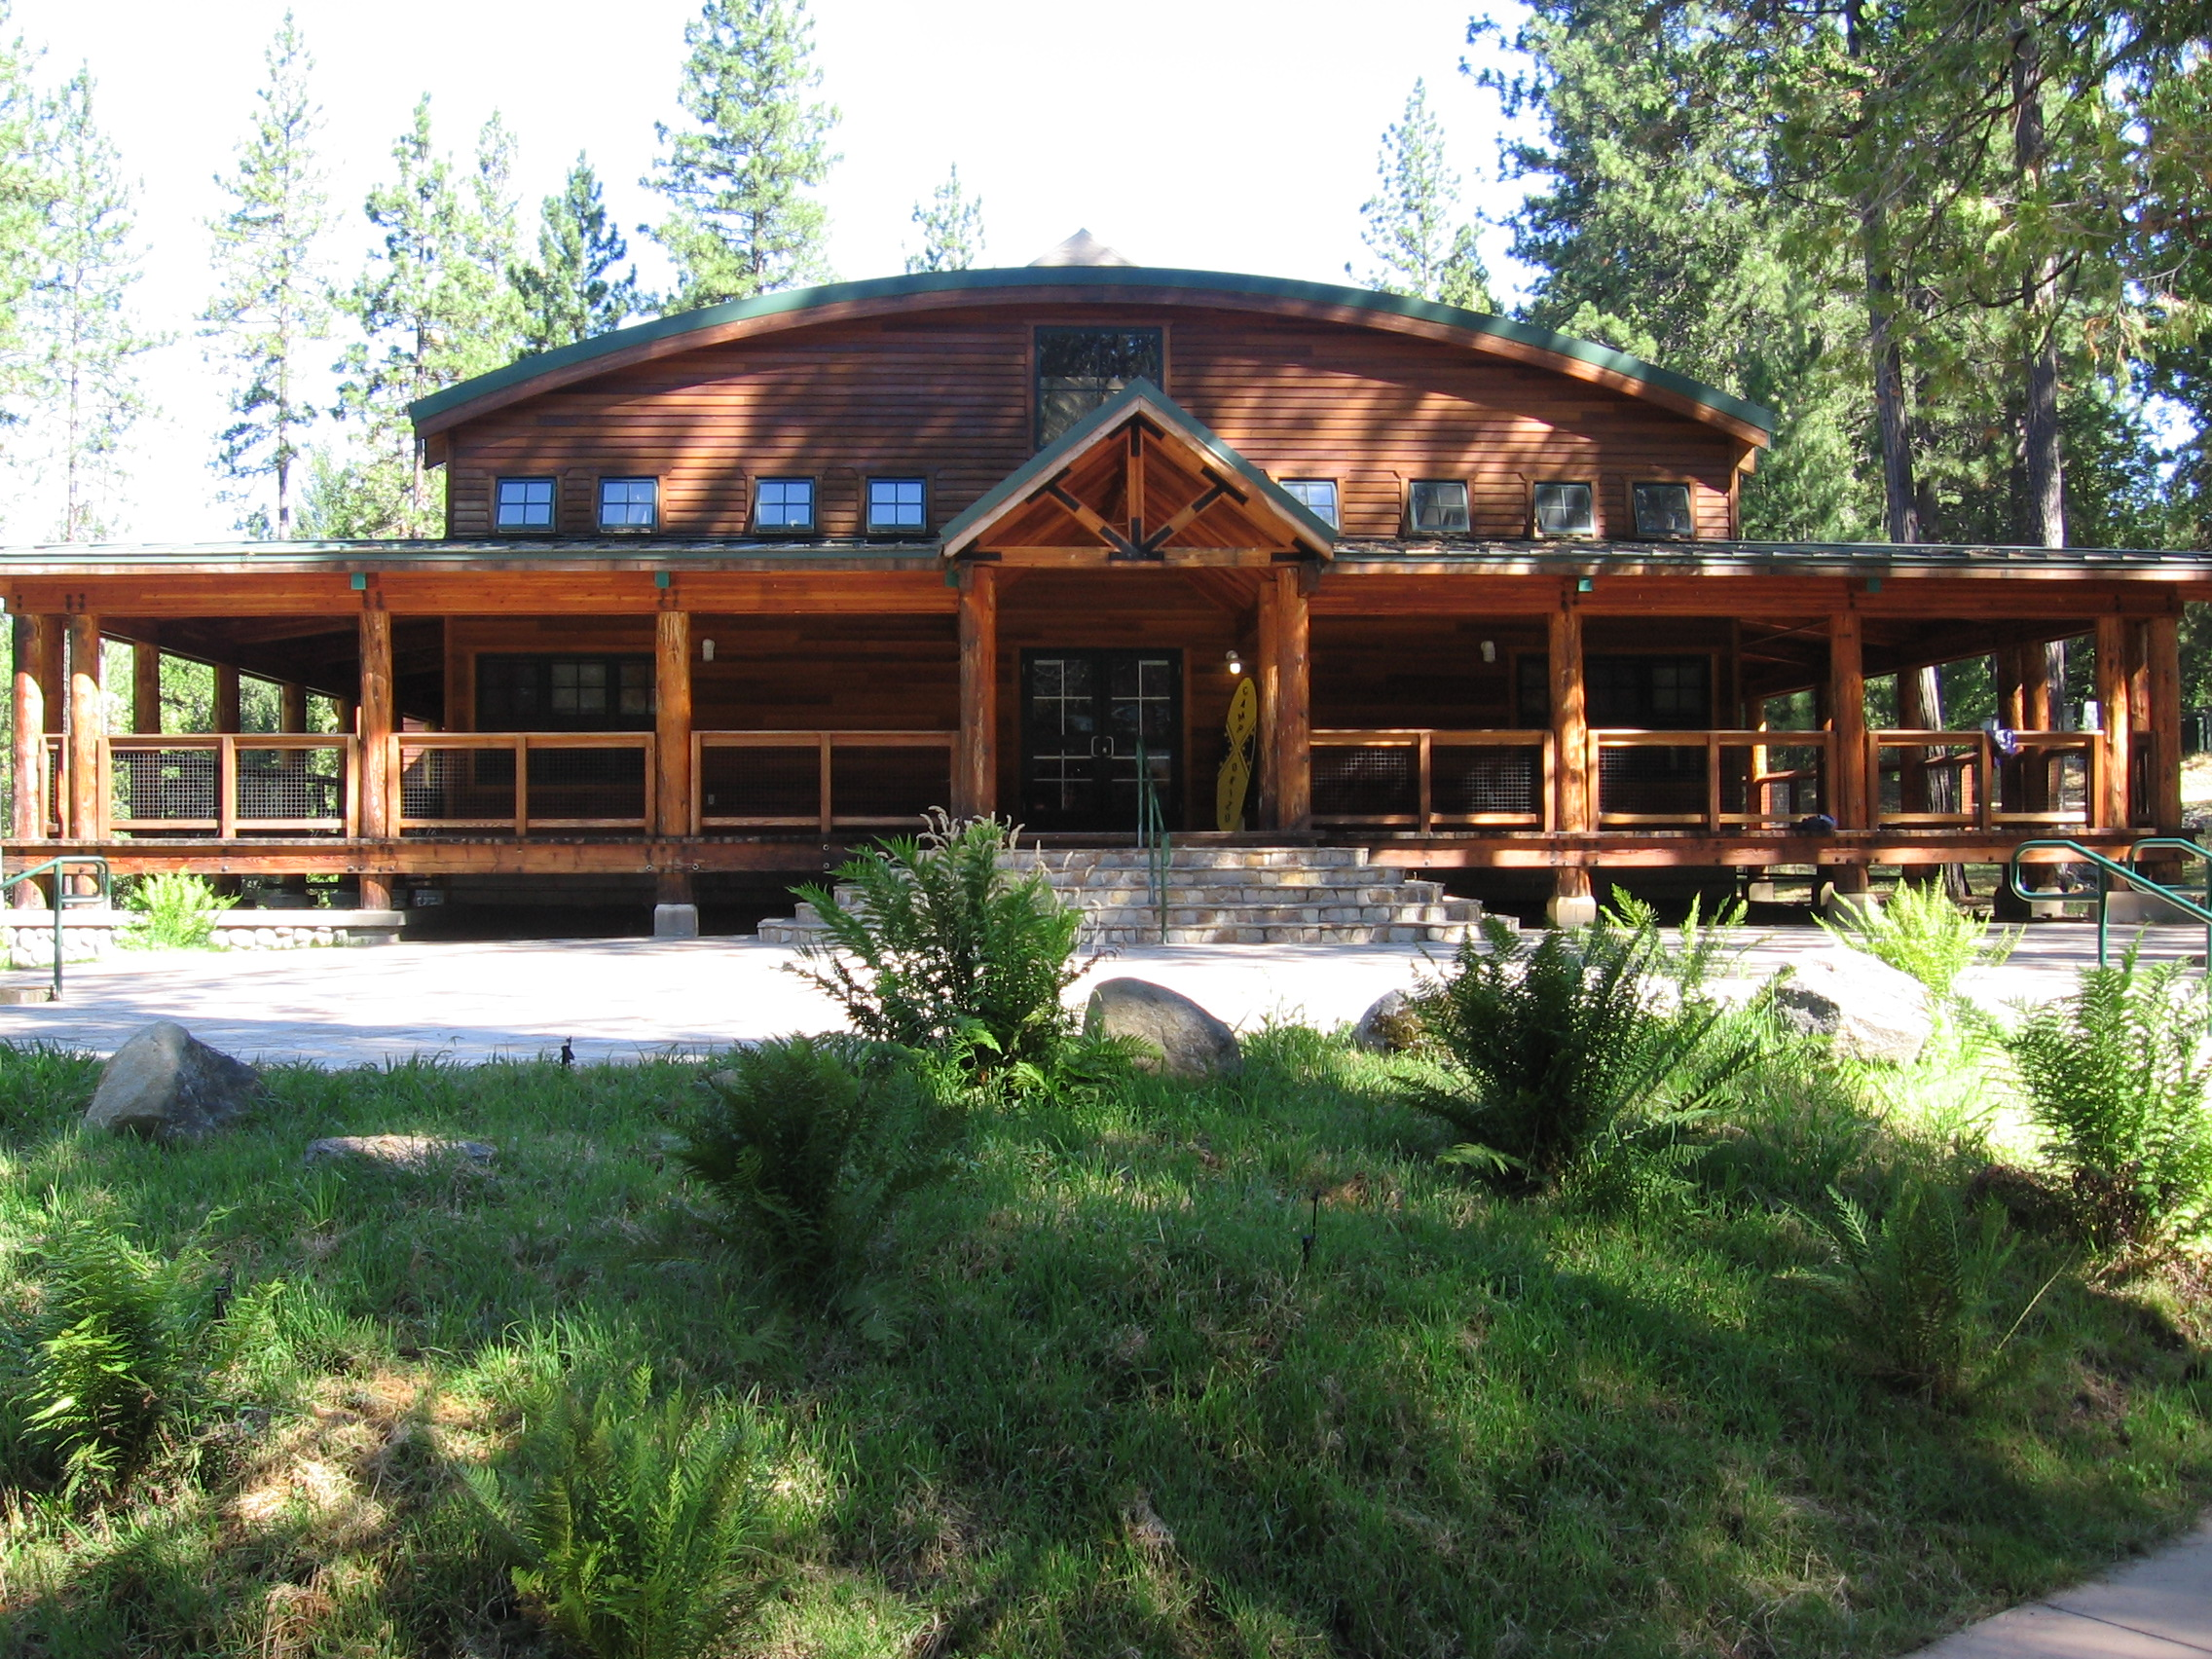 The lodge at Camp Okizu